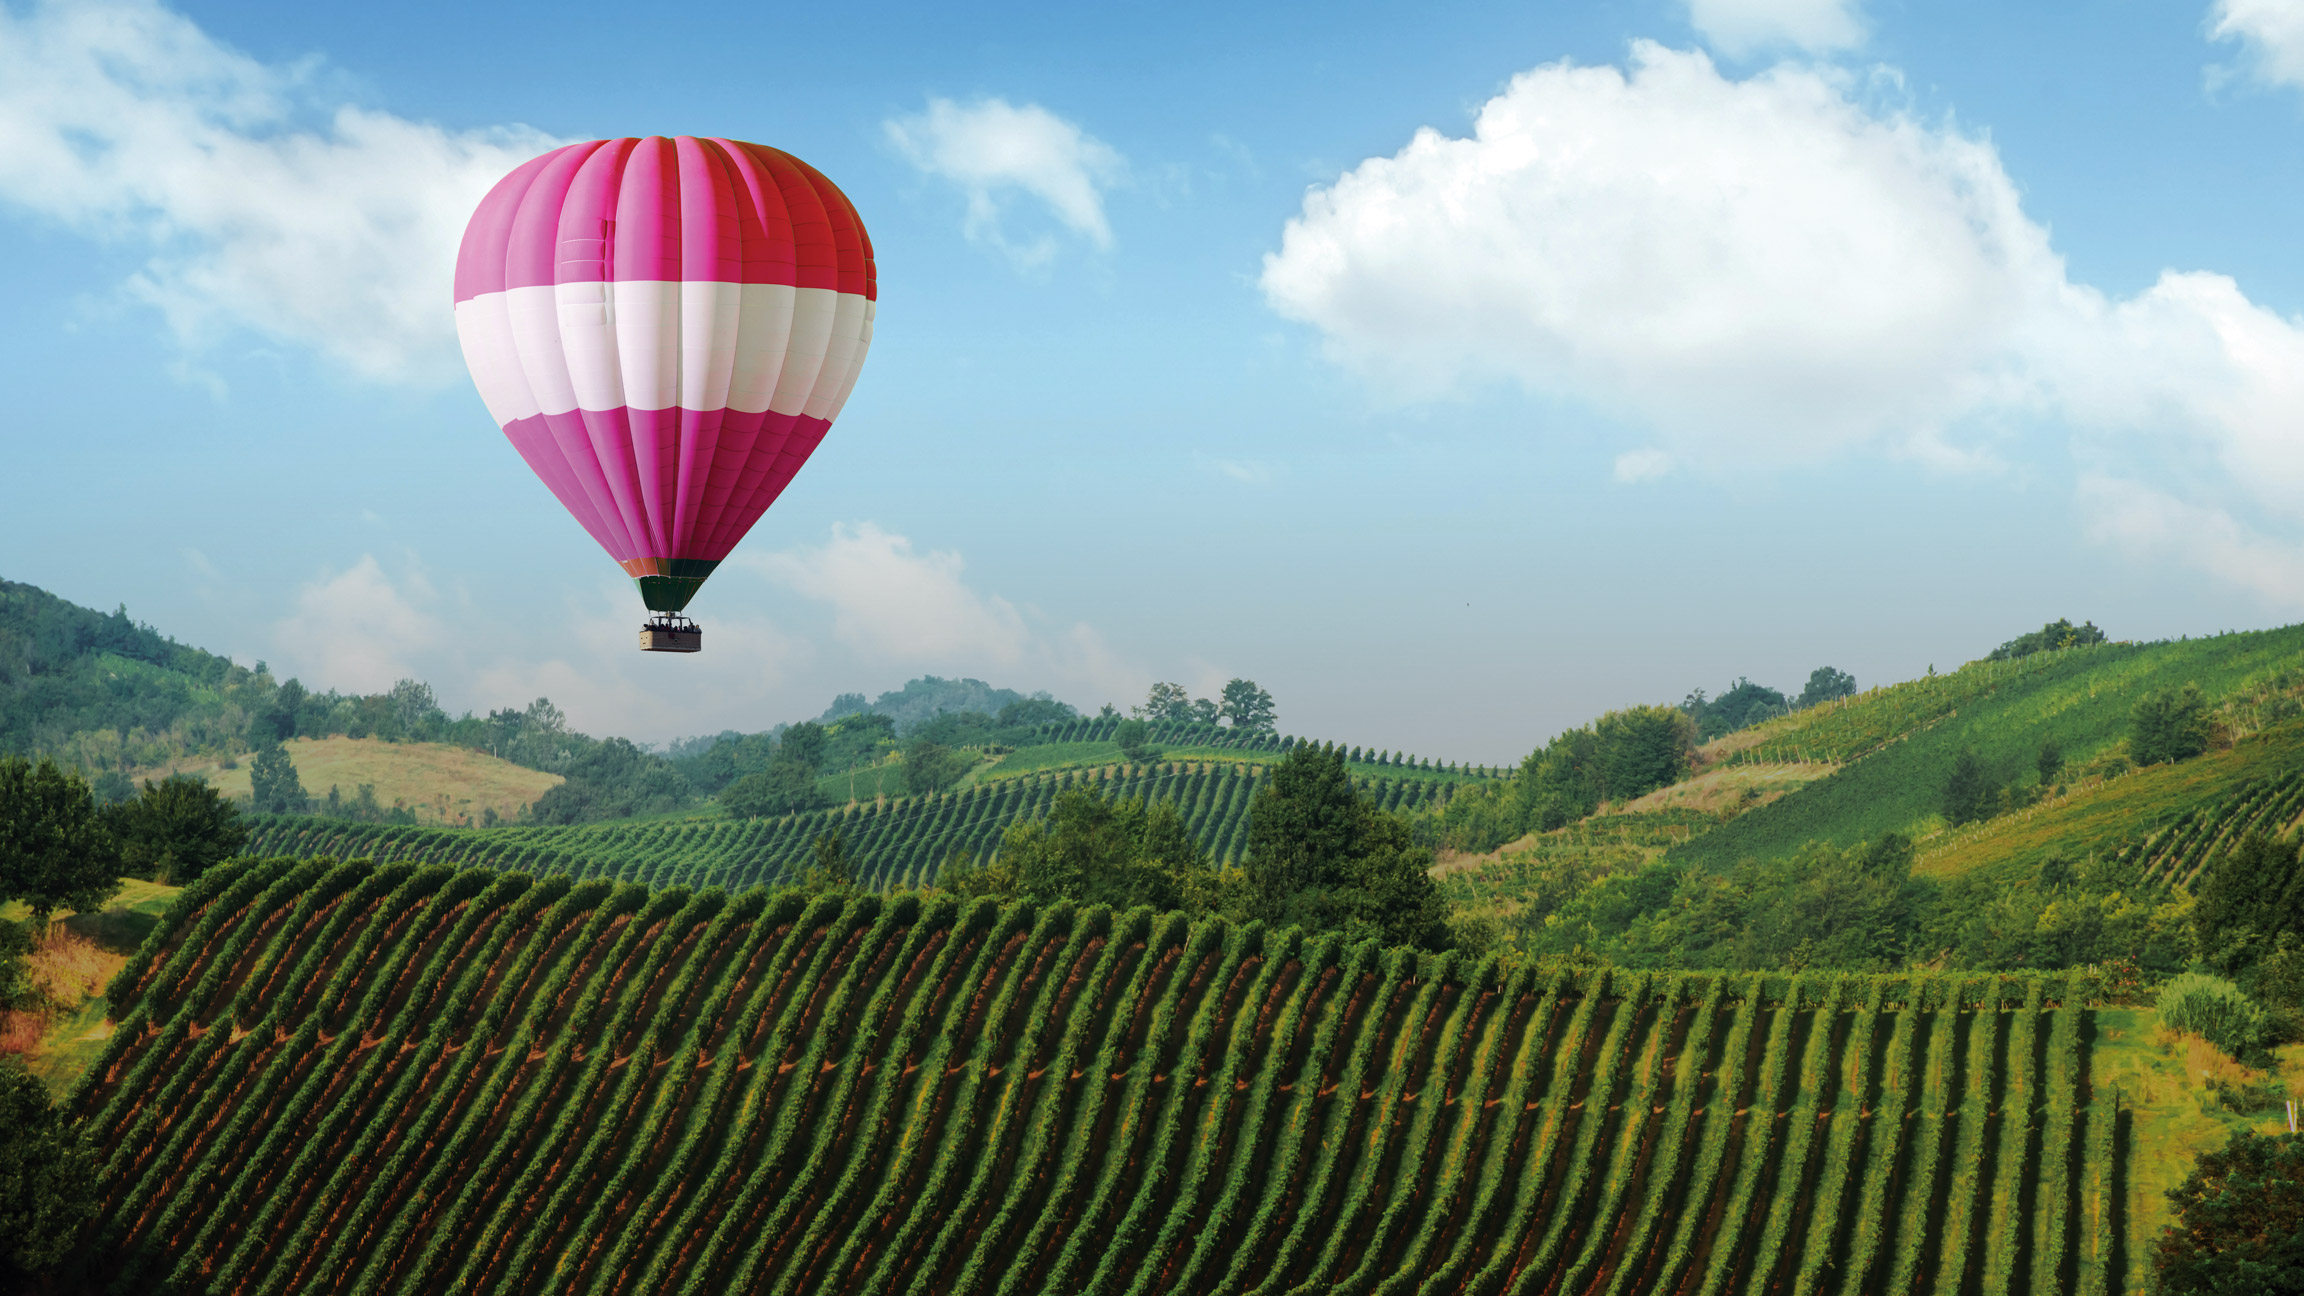 Fairmont California Wine Country Tour–Winners Choice